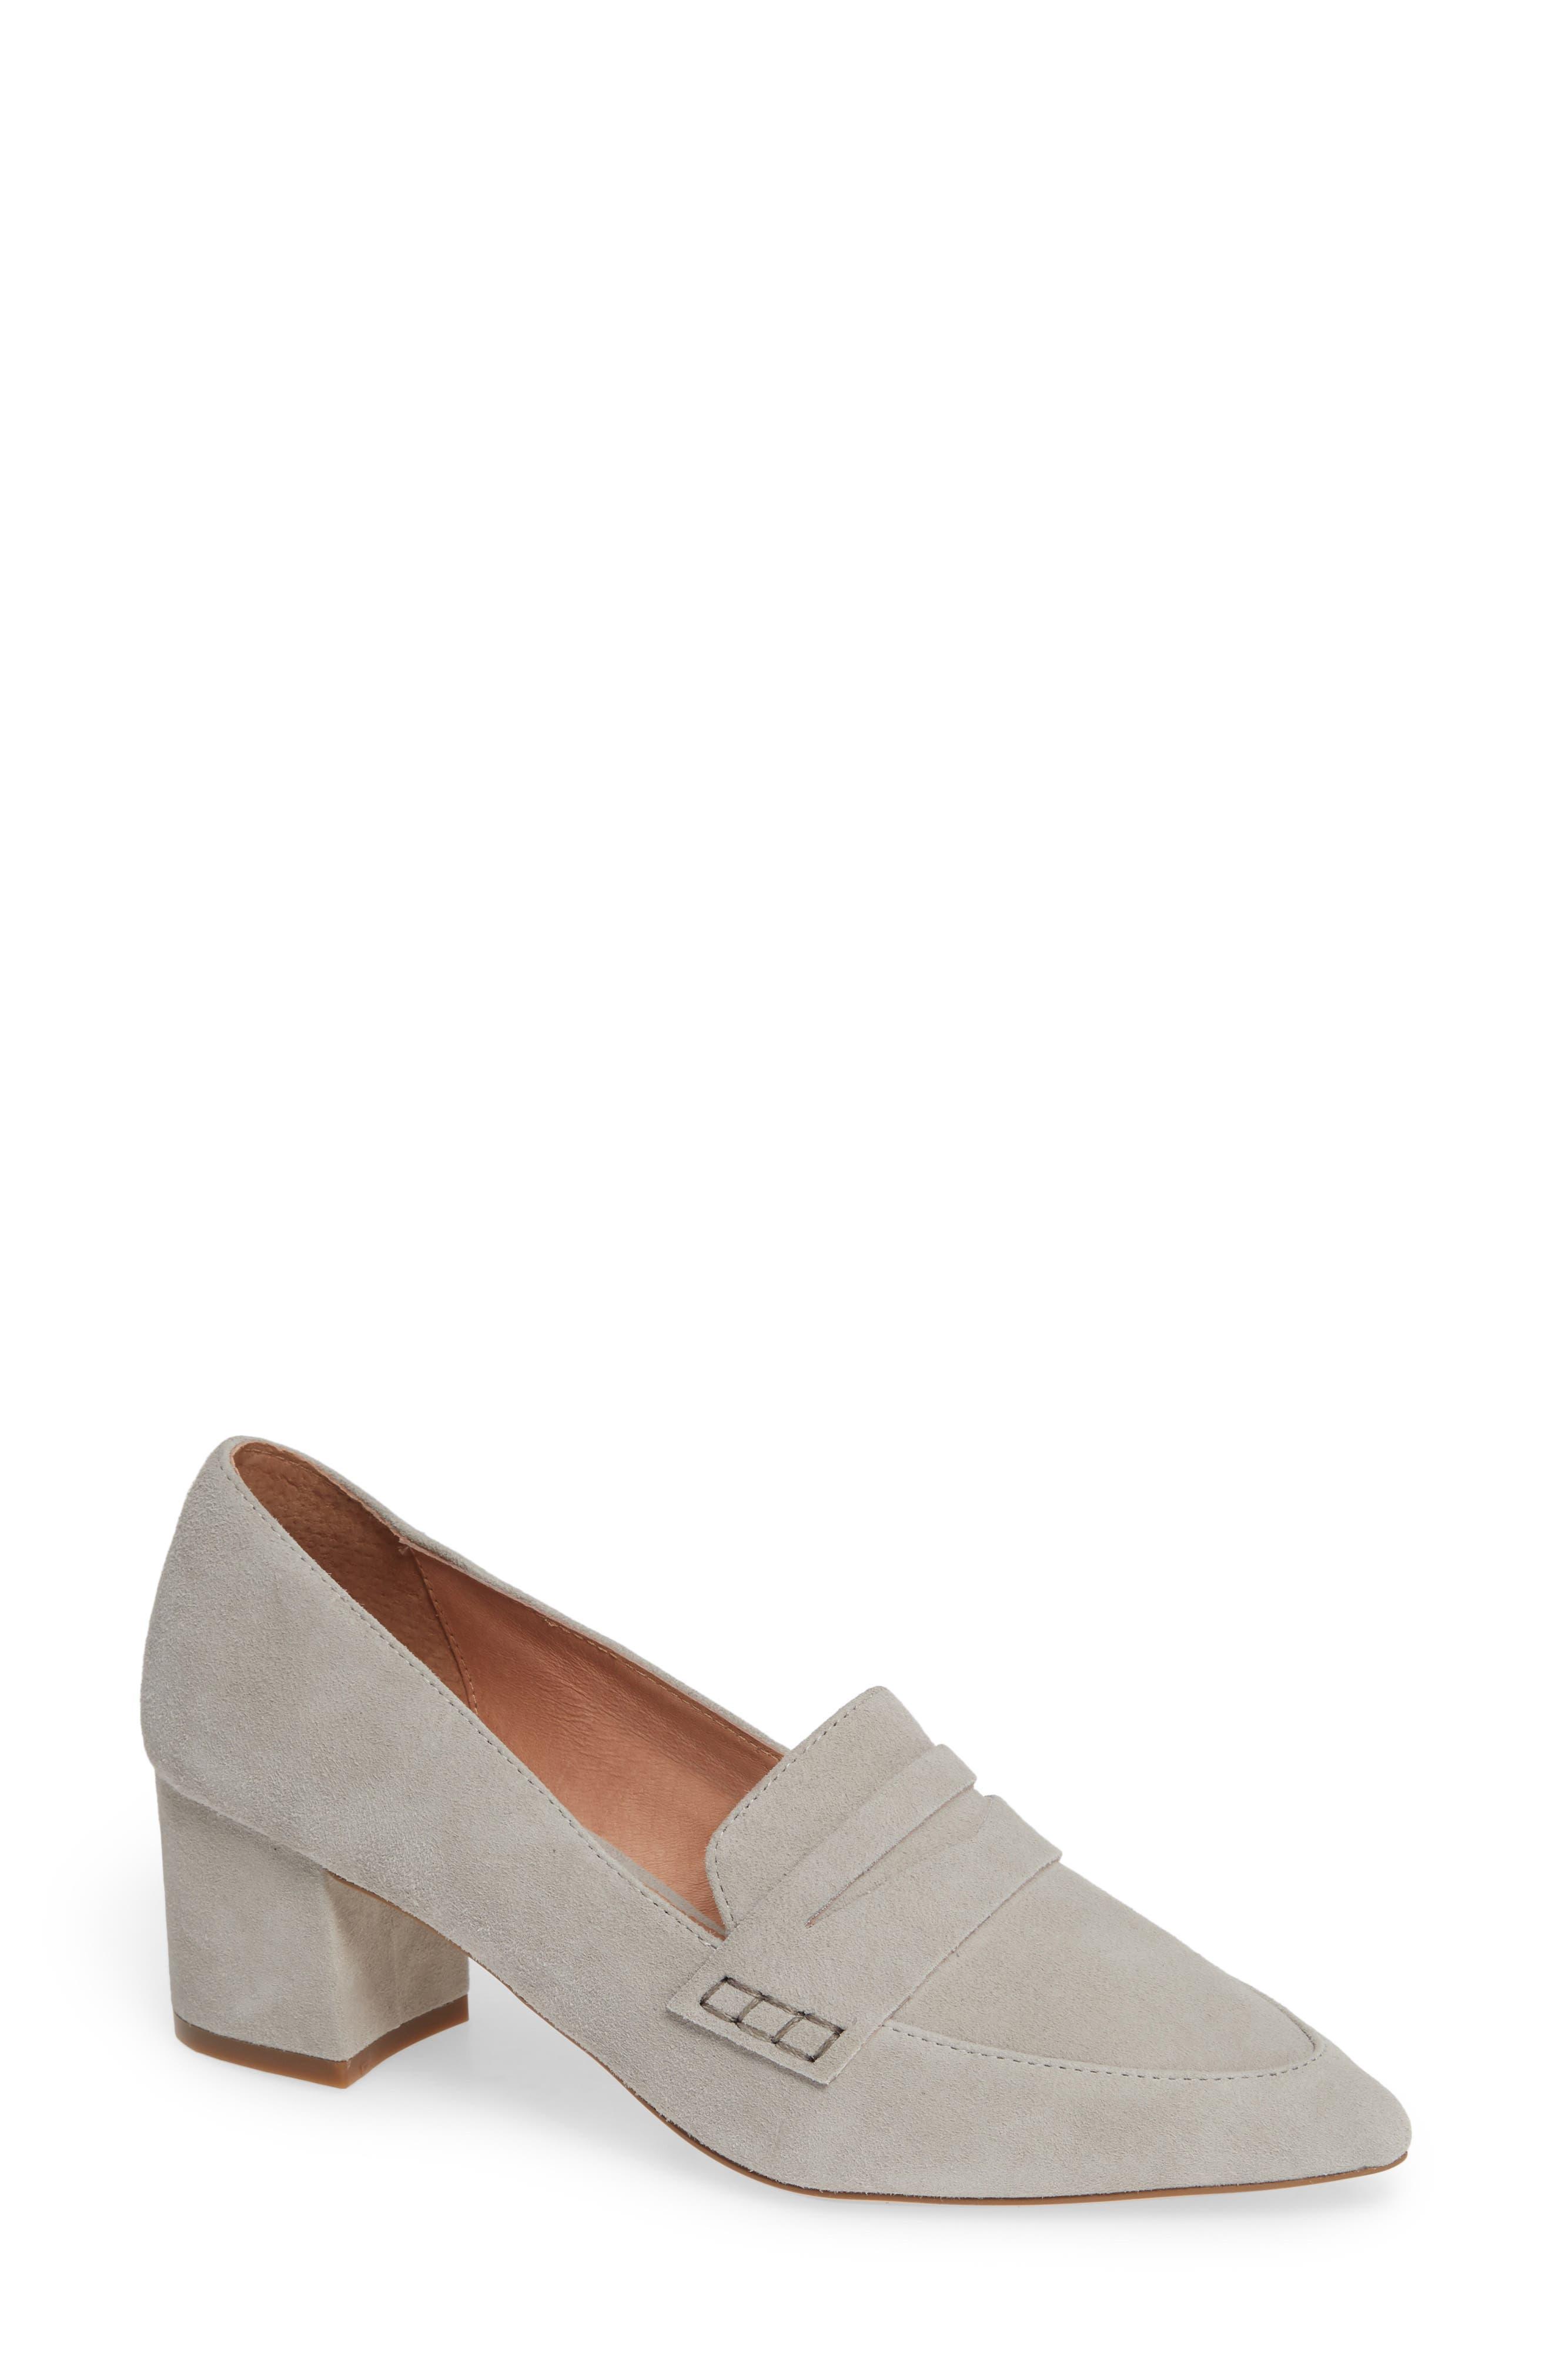 ad29c52933e Halogen Shoes for Women